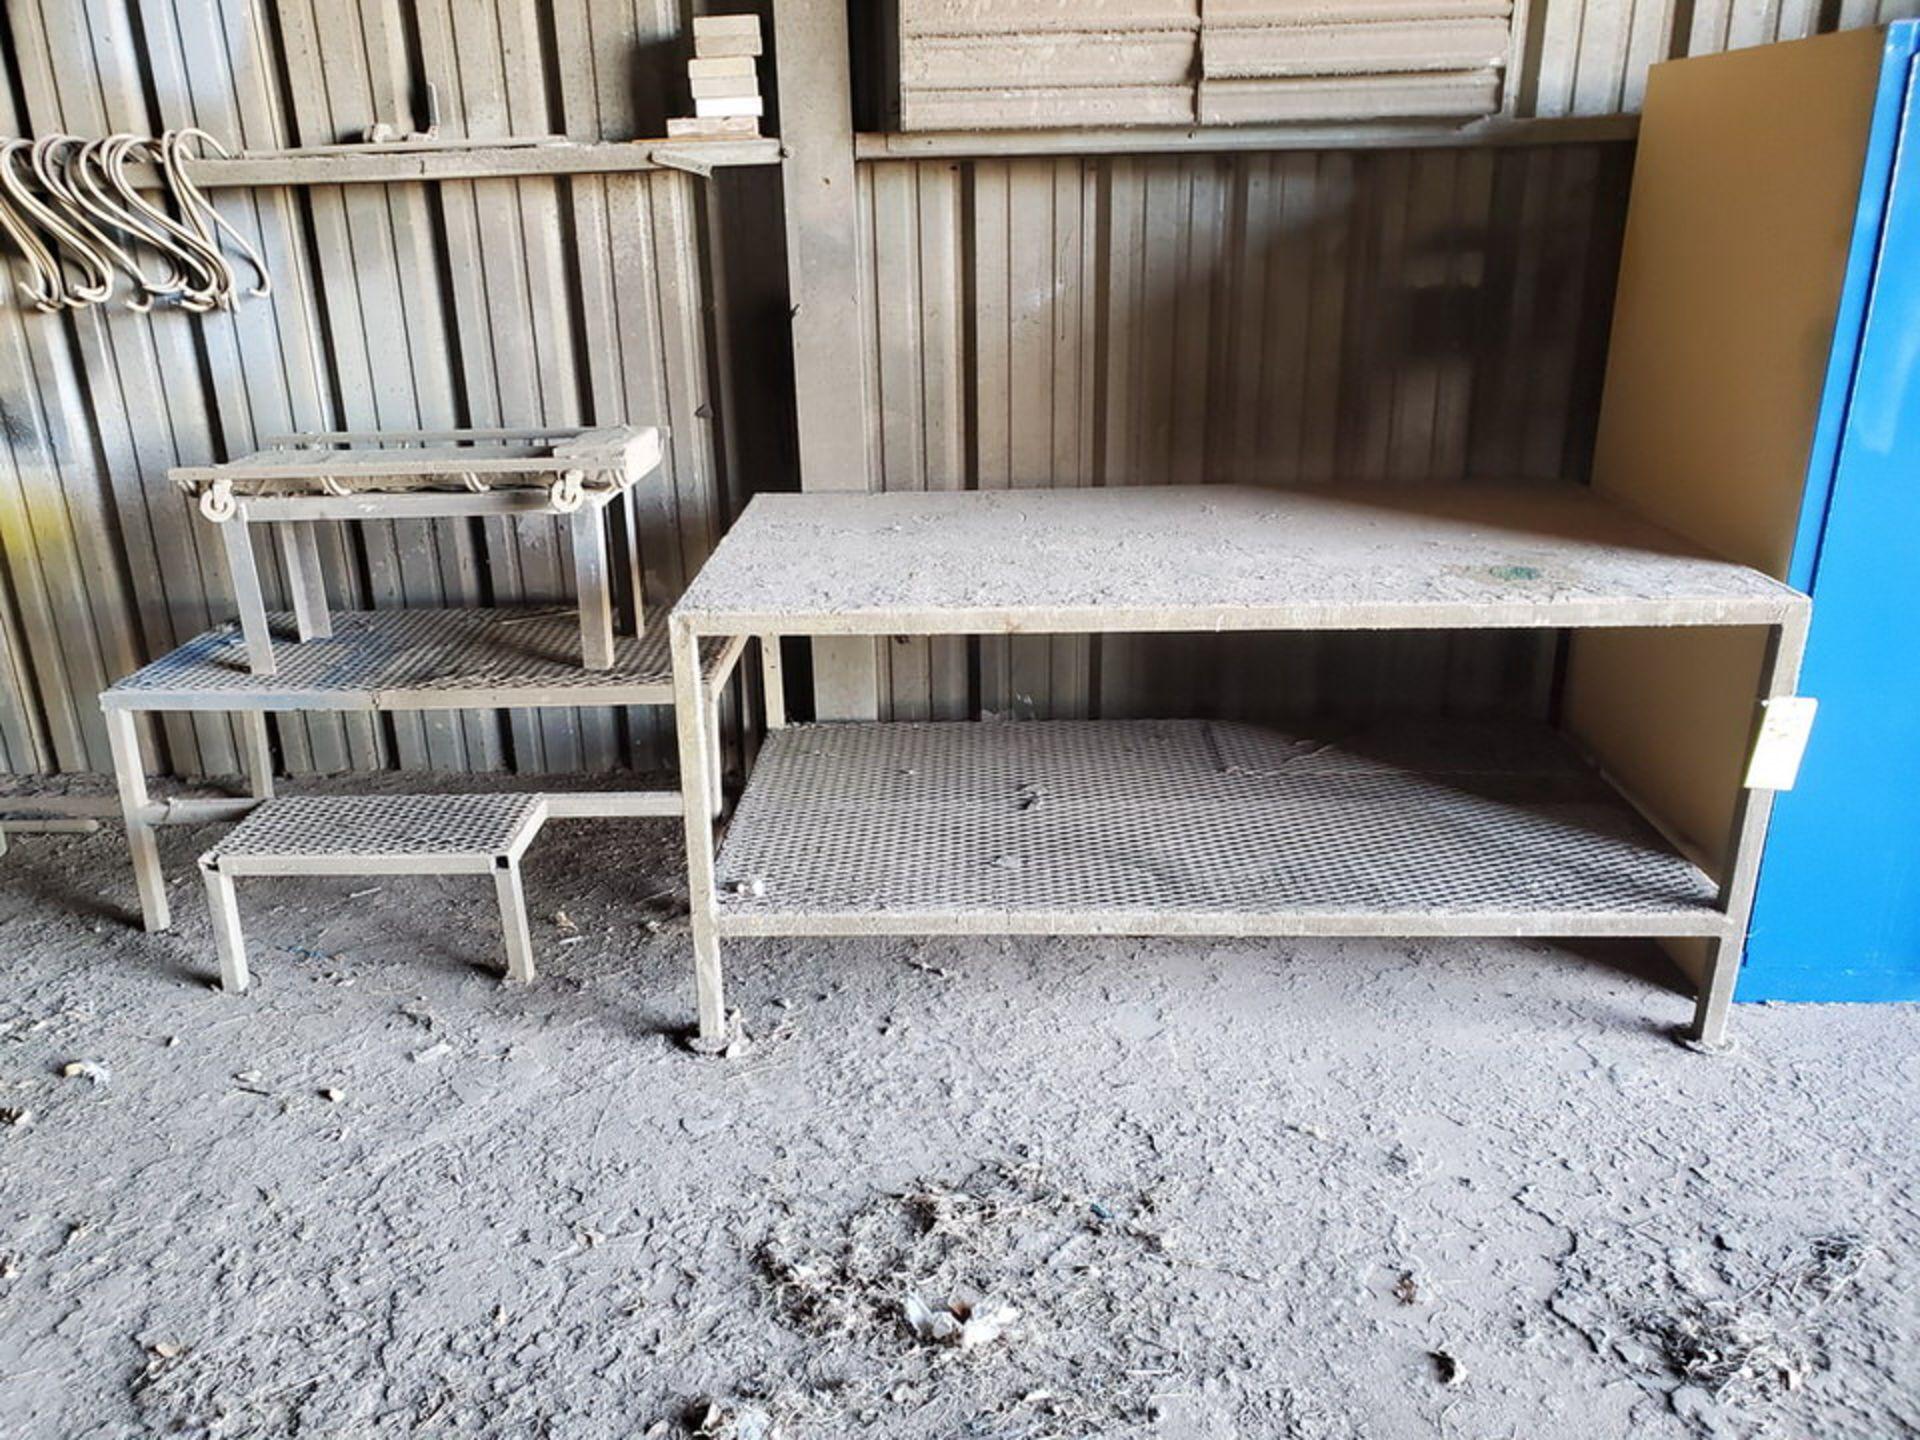 "Table & Platforms Size Range: 12"" x 30"" x 14"" - 40"" x 72"" x 33""; W/ Creeper Seat"